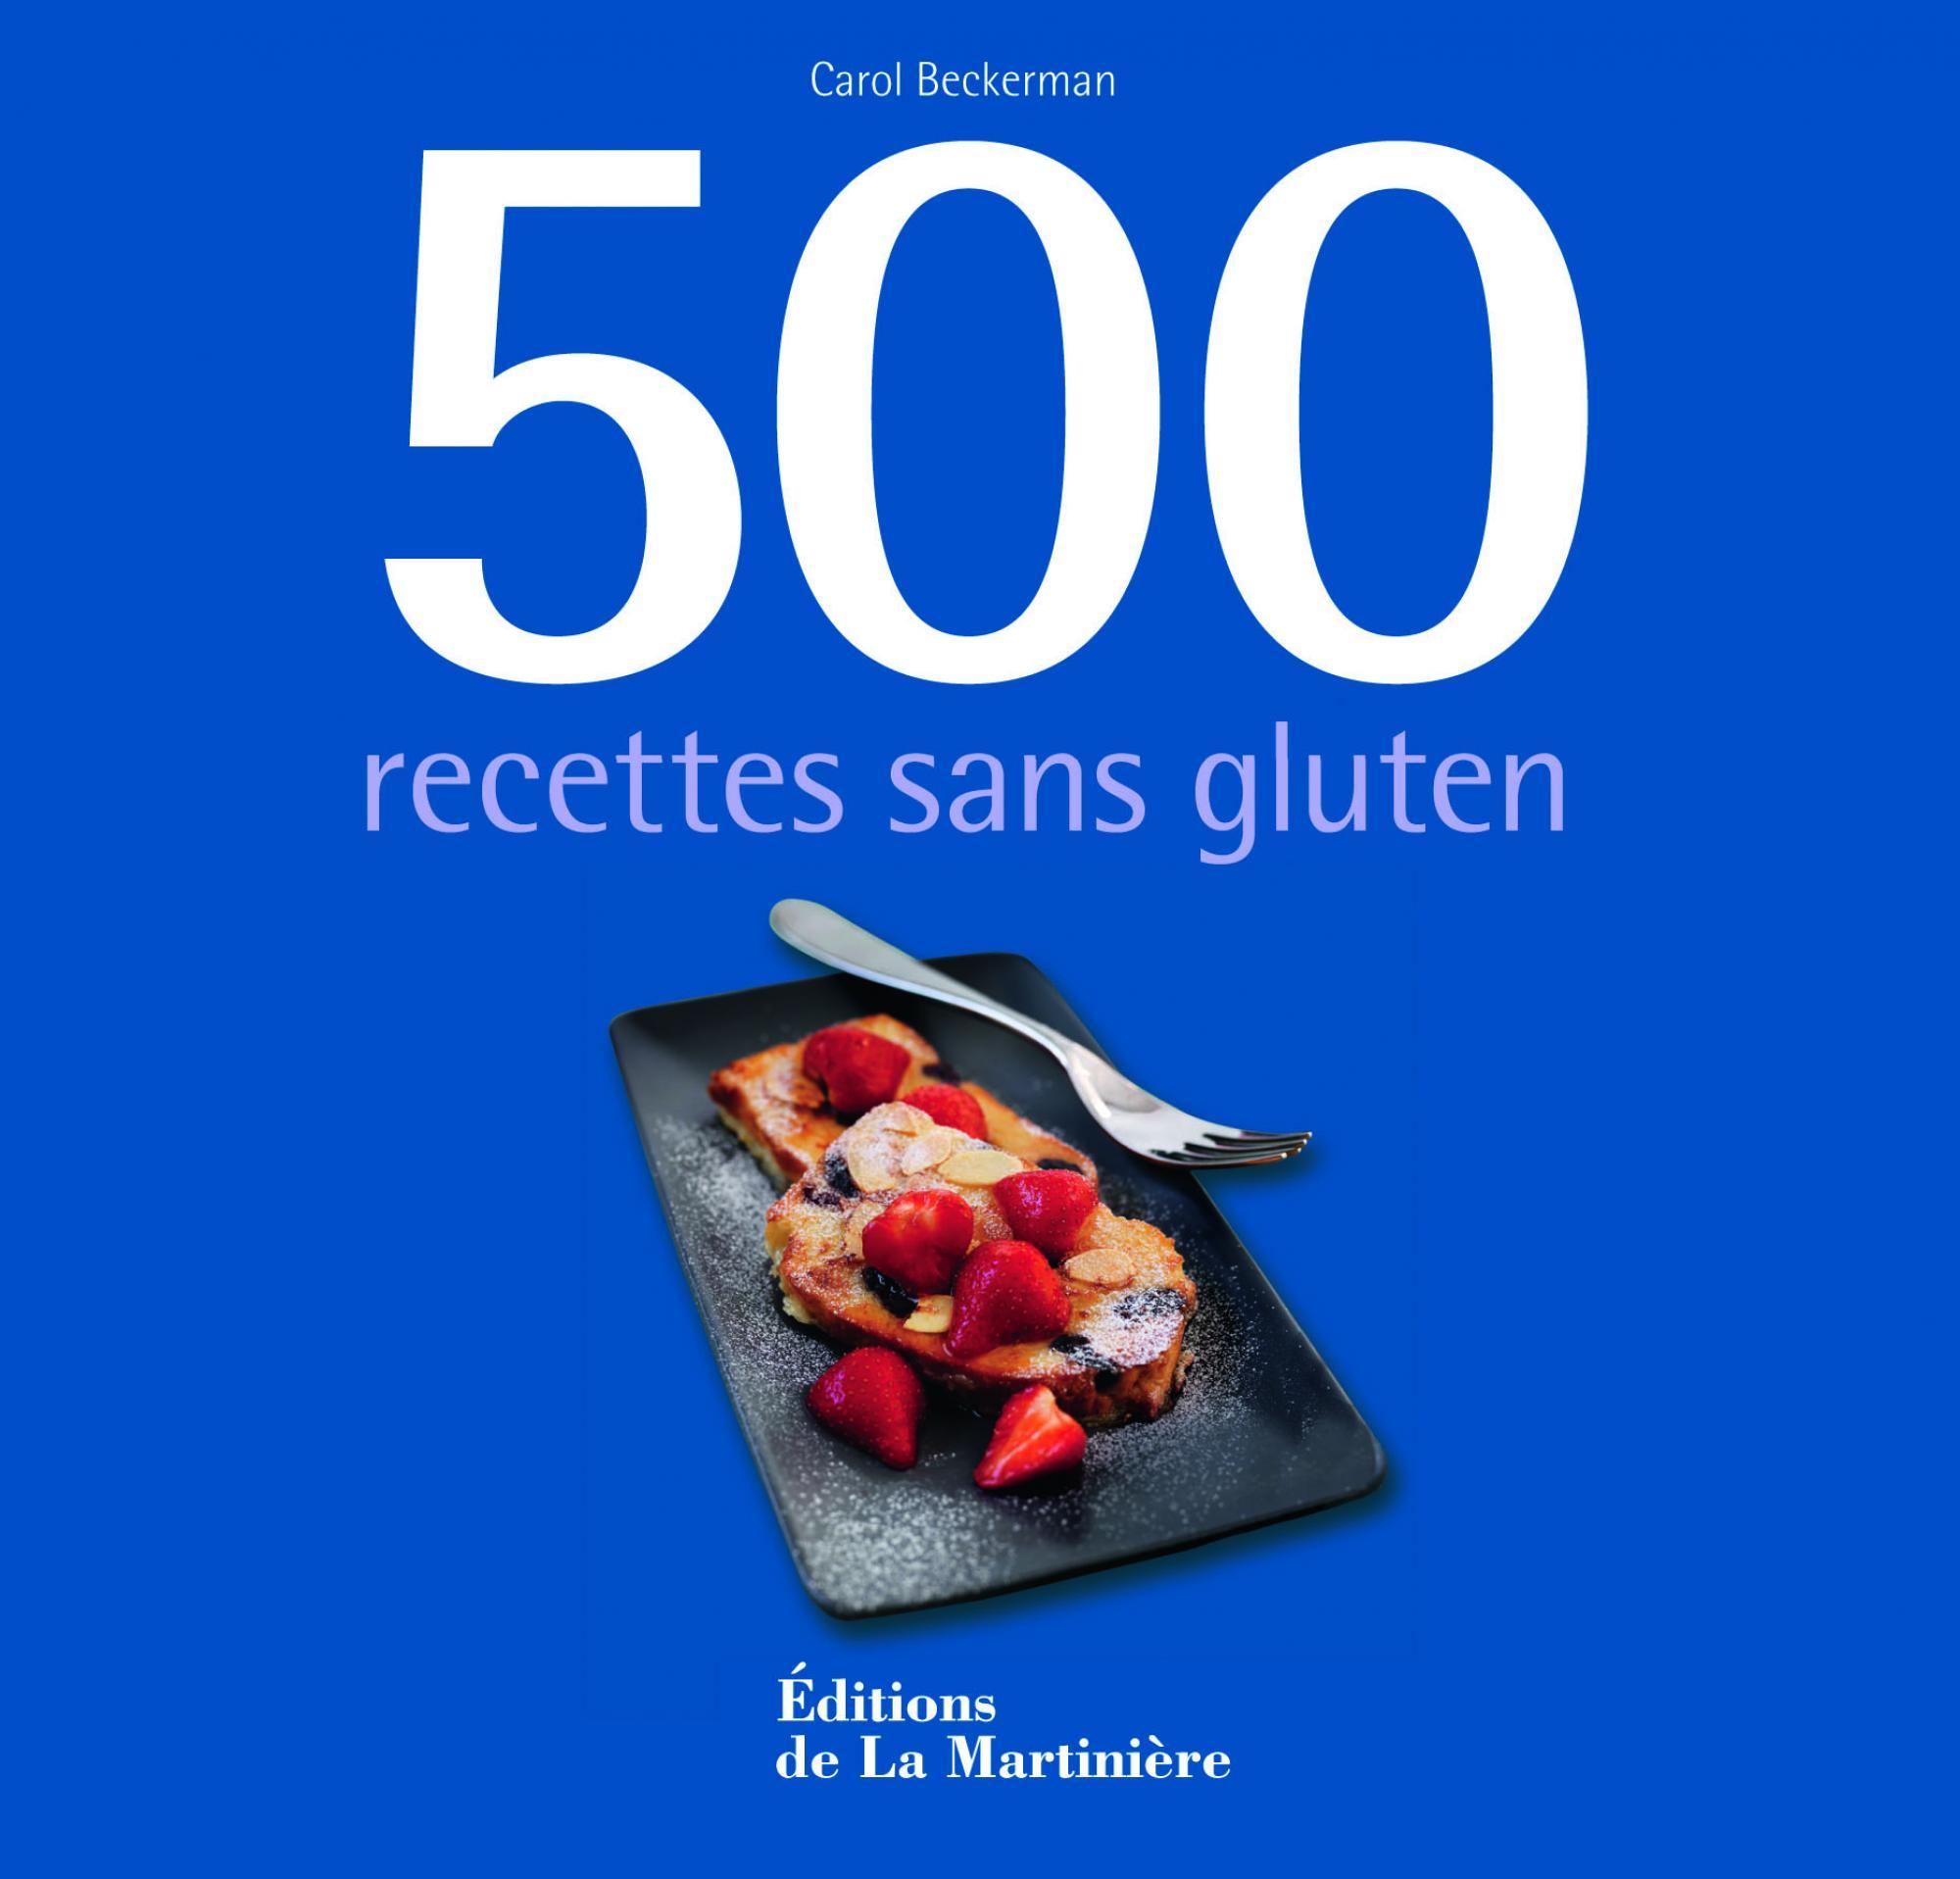 500 recettes sans gluten - carol beckerman | editions de la martinière